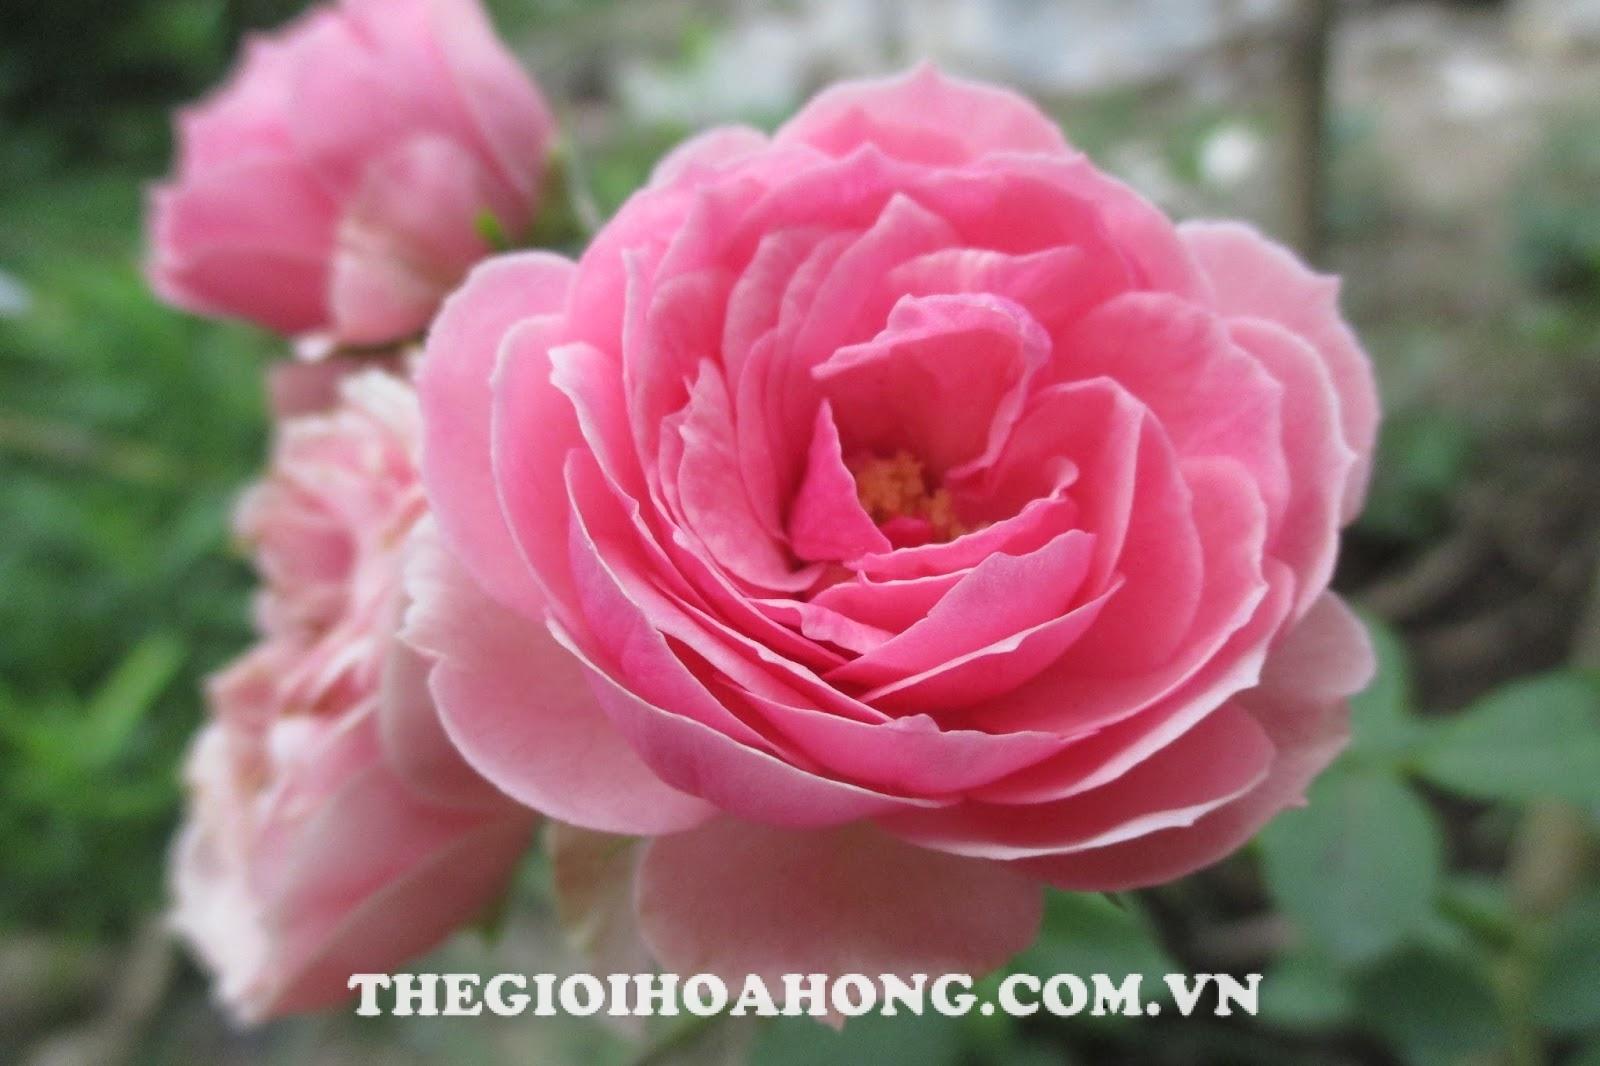 Hoa hồng ngoại The Ingenious Mr. Fairchild Rose